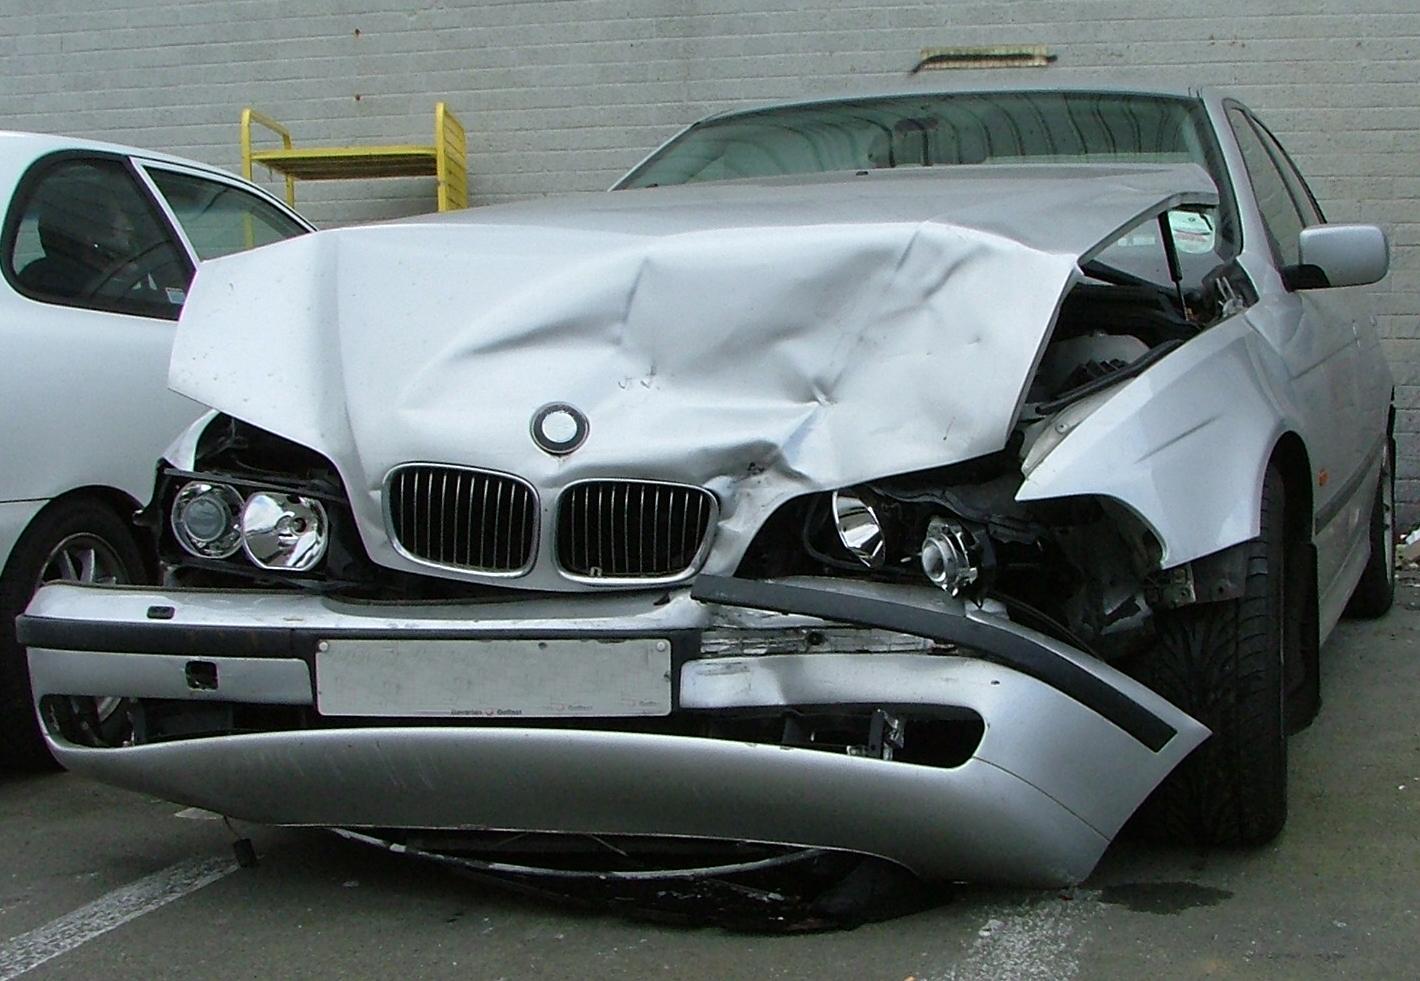 Speedmonkey: The saddest looking car ever